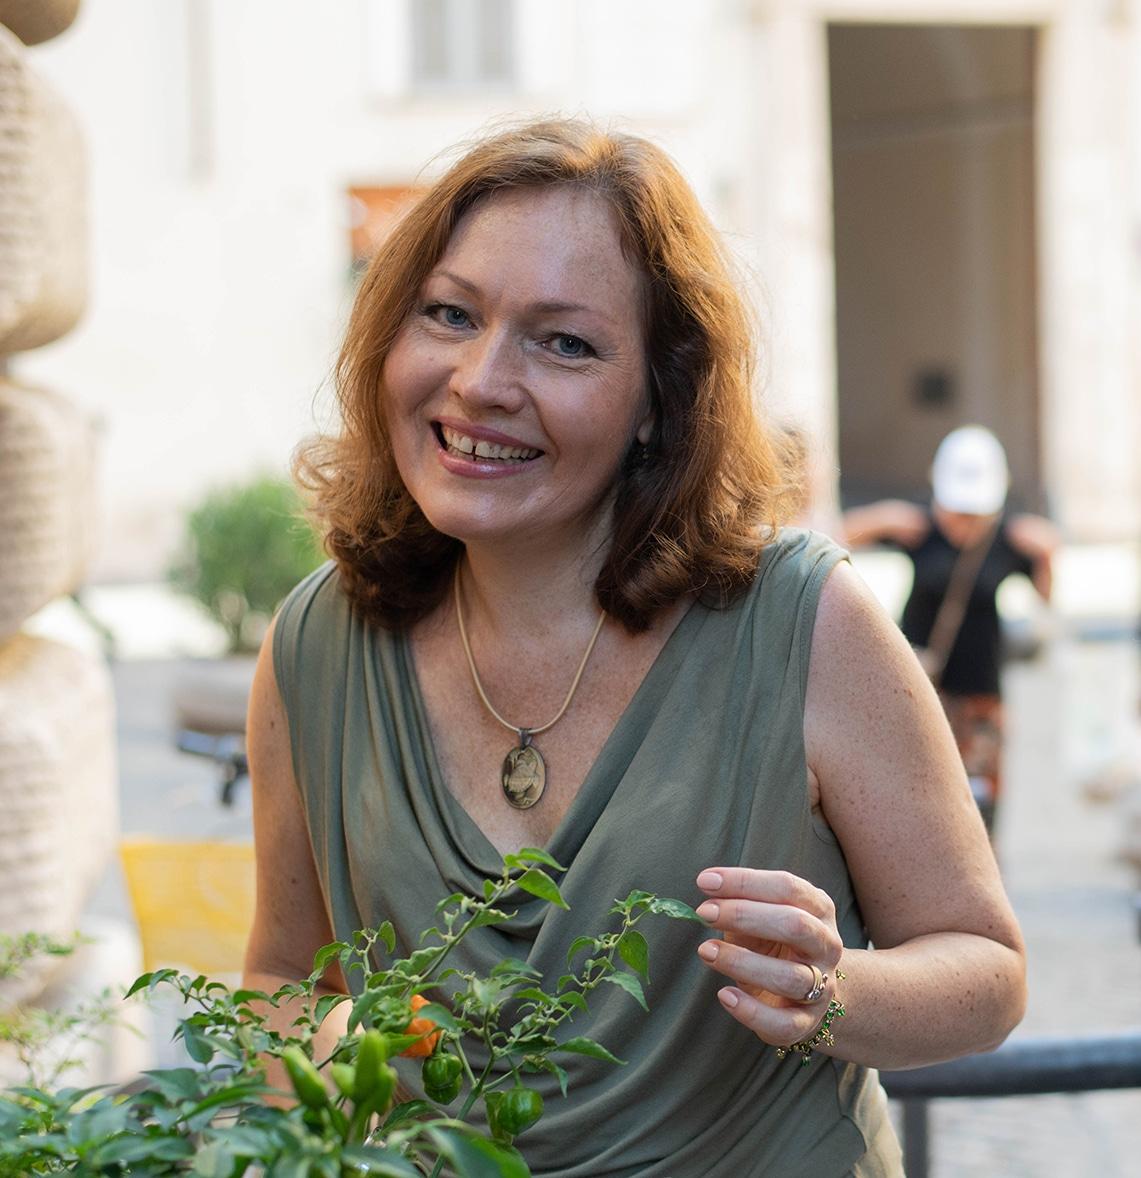 Ирина Орлова